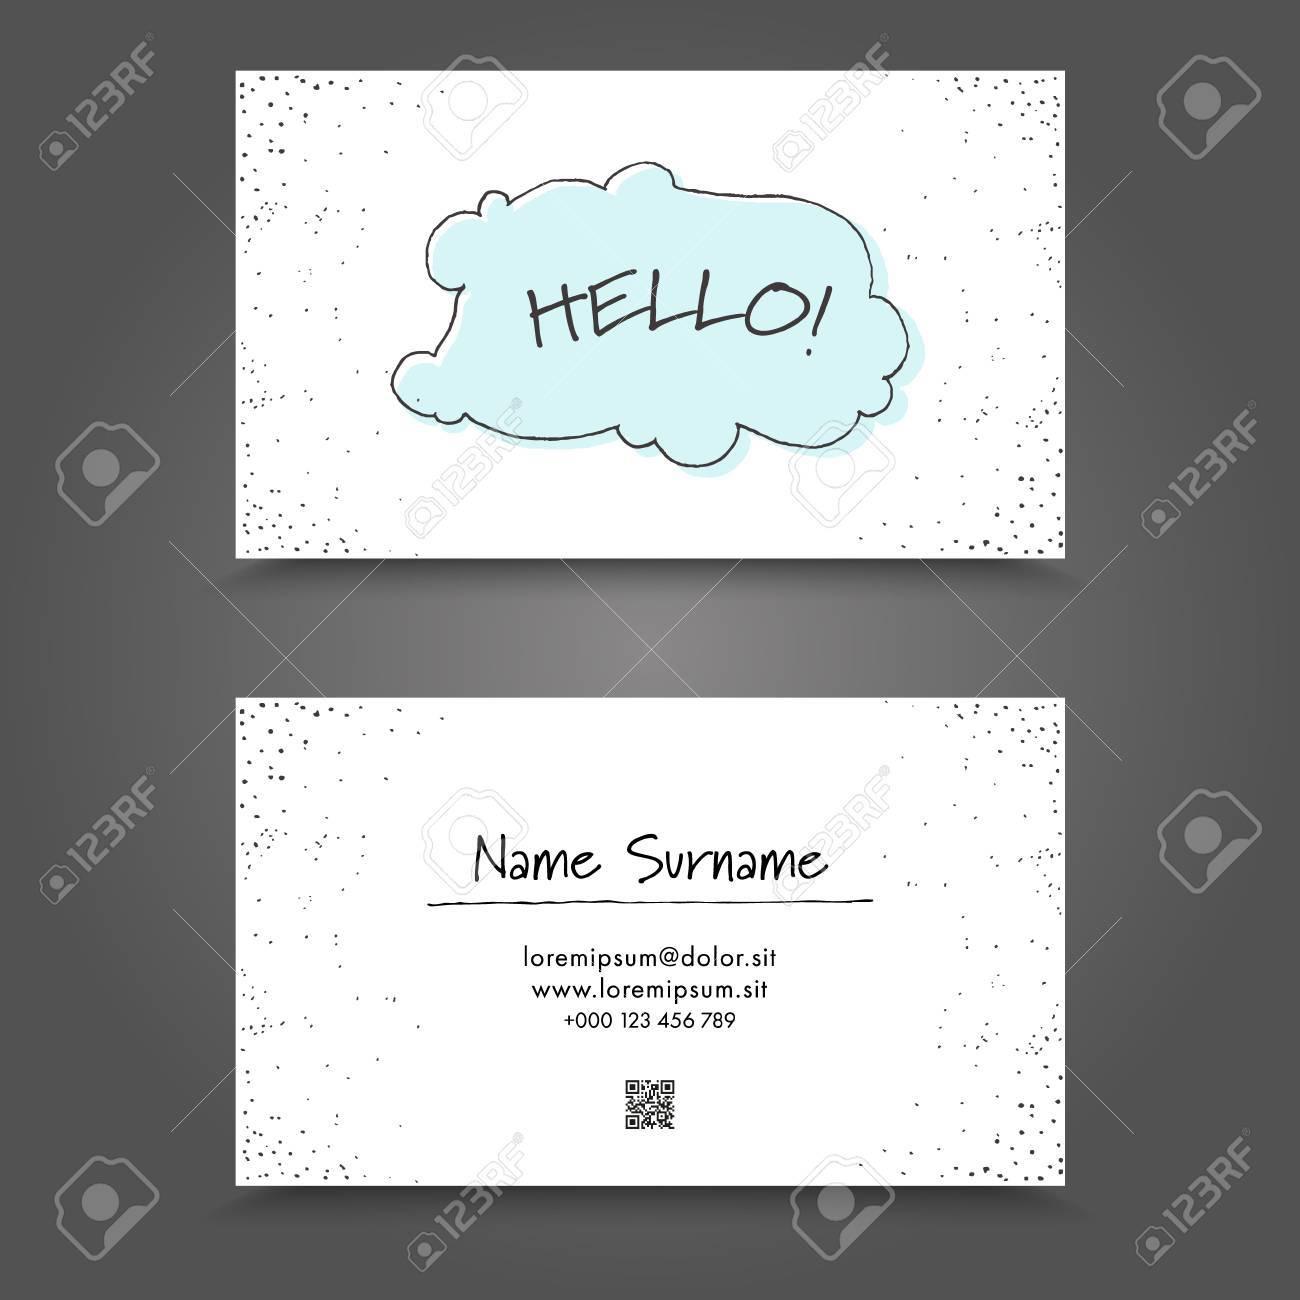 Carte De Visite Avec Handdrawing Cadre Drle Handdraw Business Card